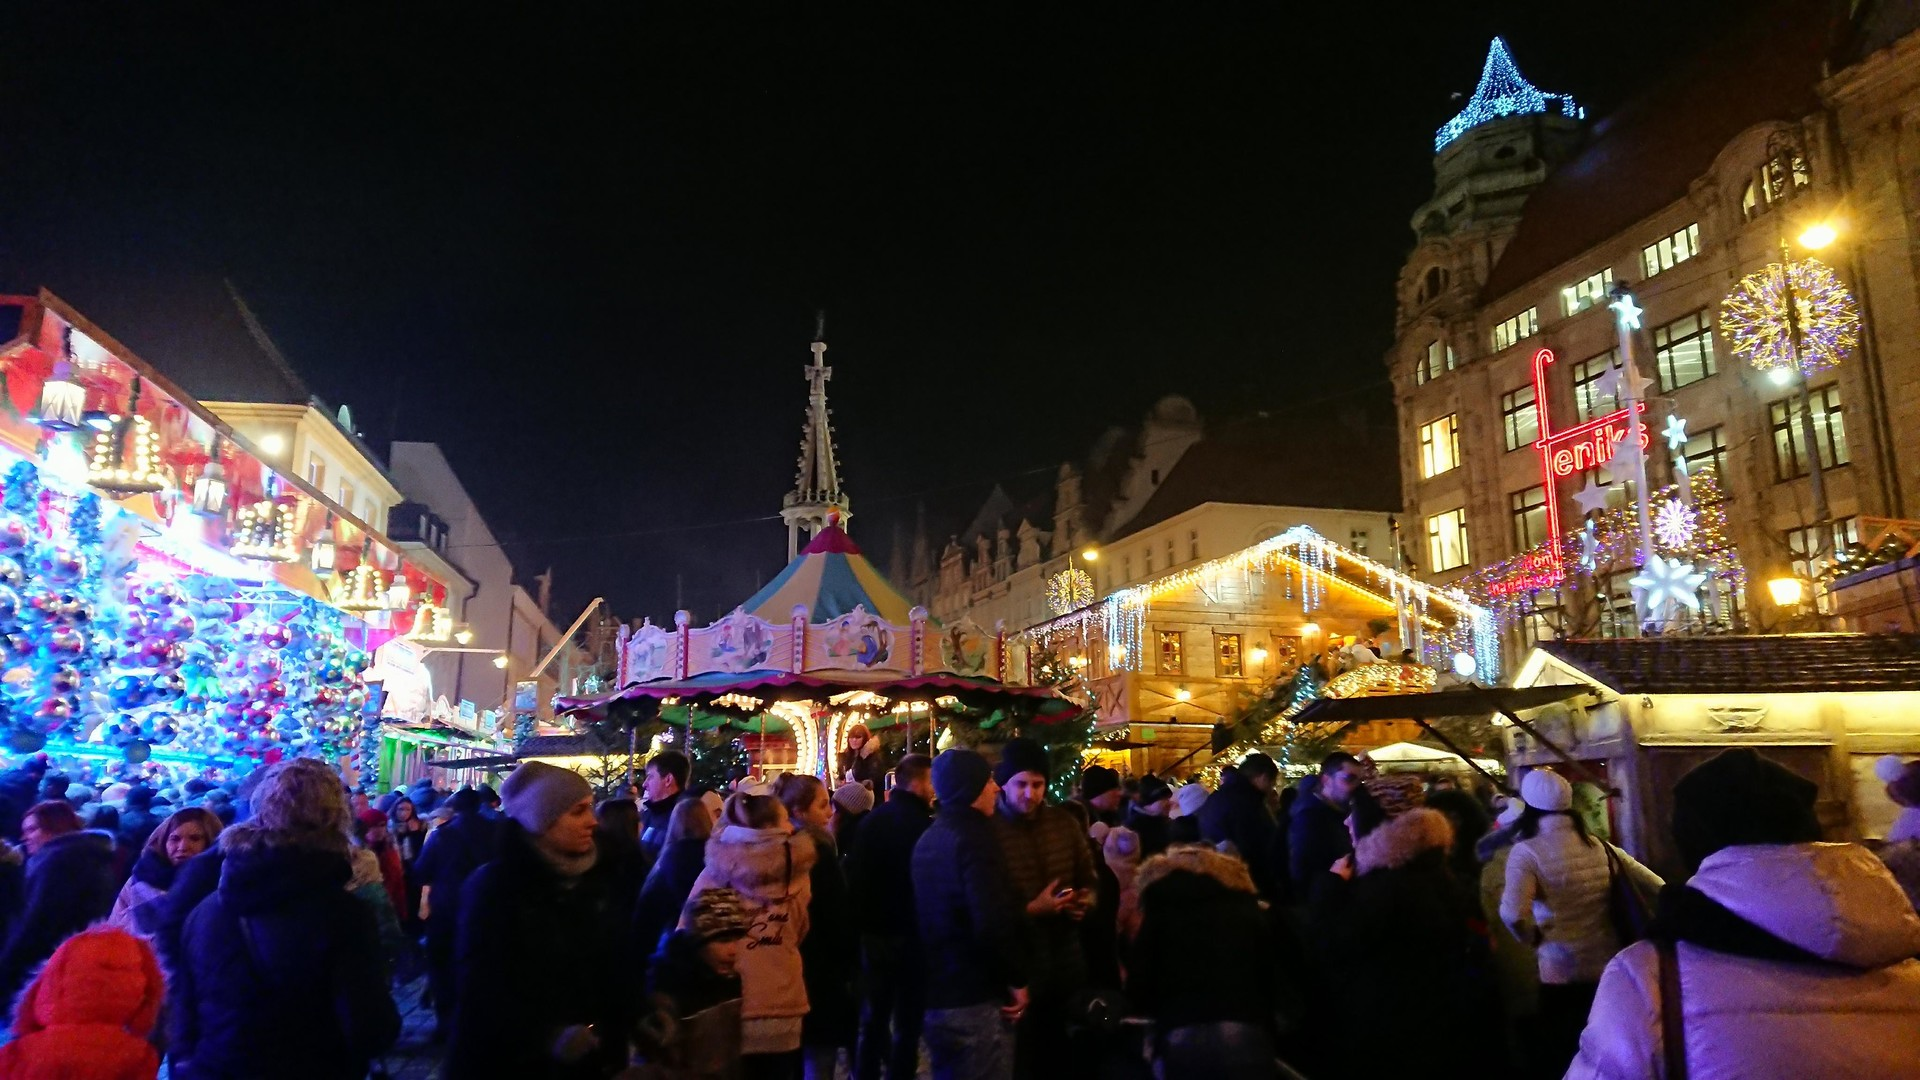 Christmas in Wrocław